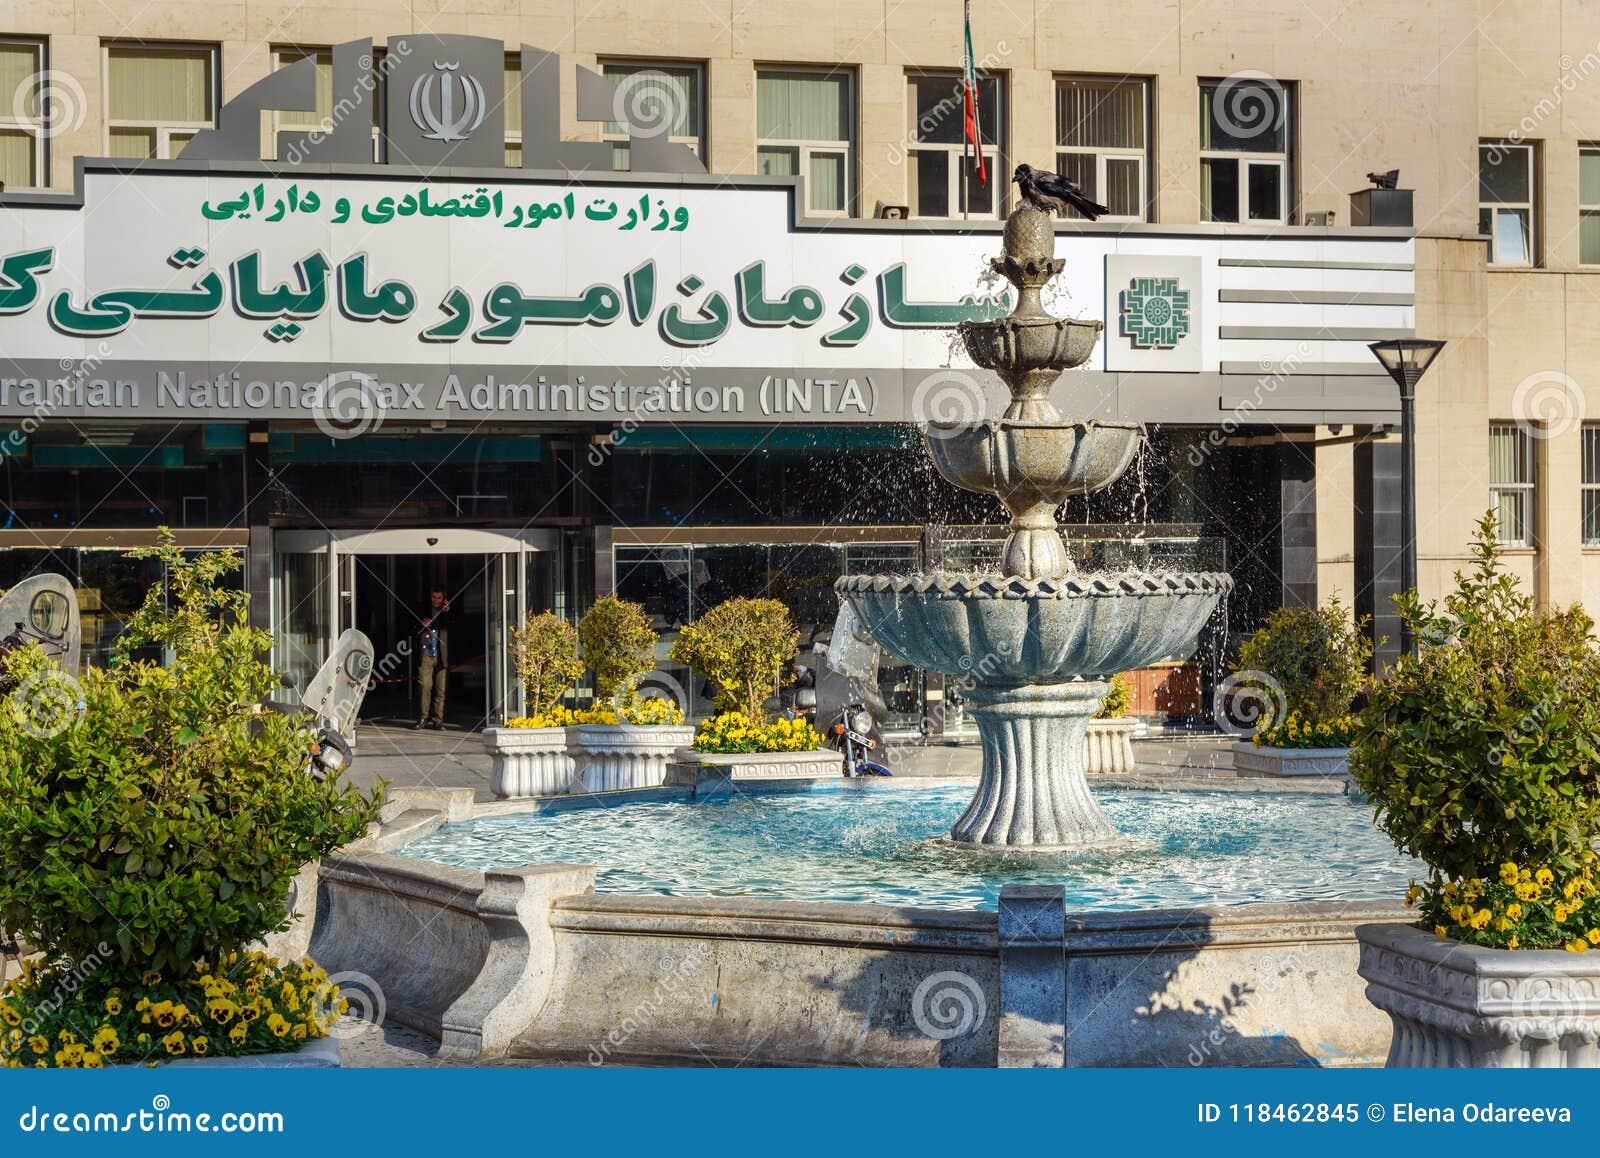 Fuente cerca de la administración fiscal nacional iraní en Teherán irán